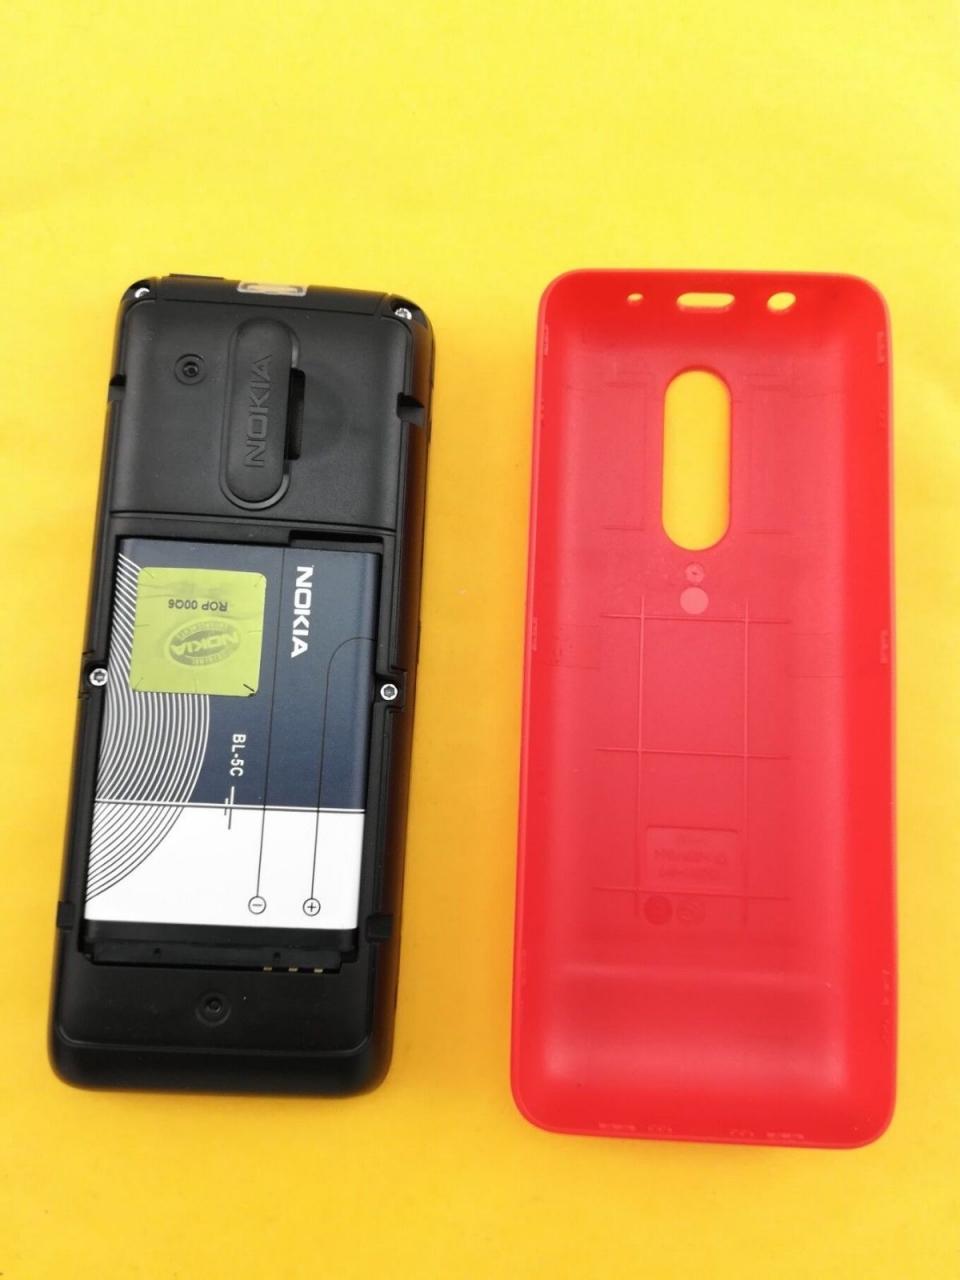 new Nokia 106 Unlocked Simple Mobile Phone Multiple keyboards languages white 9